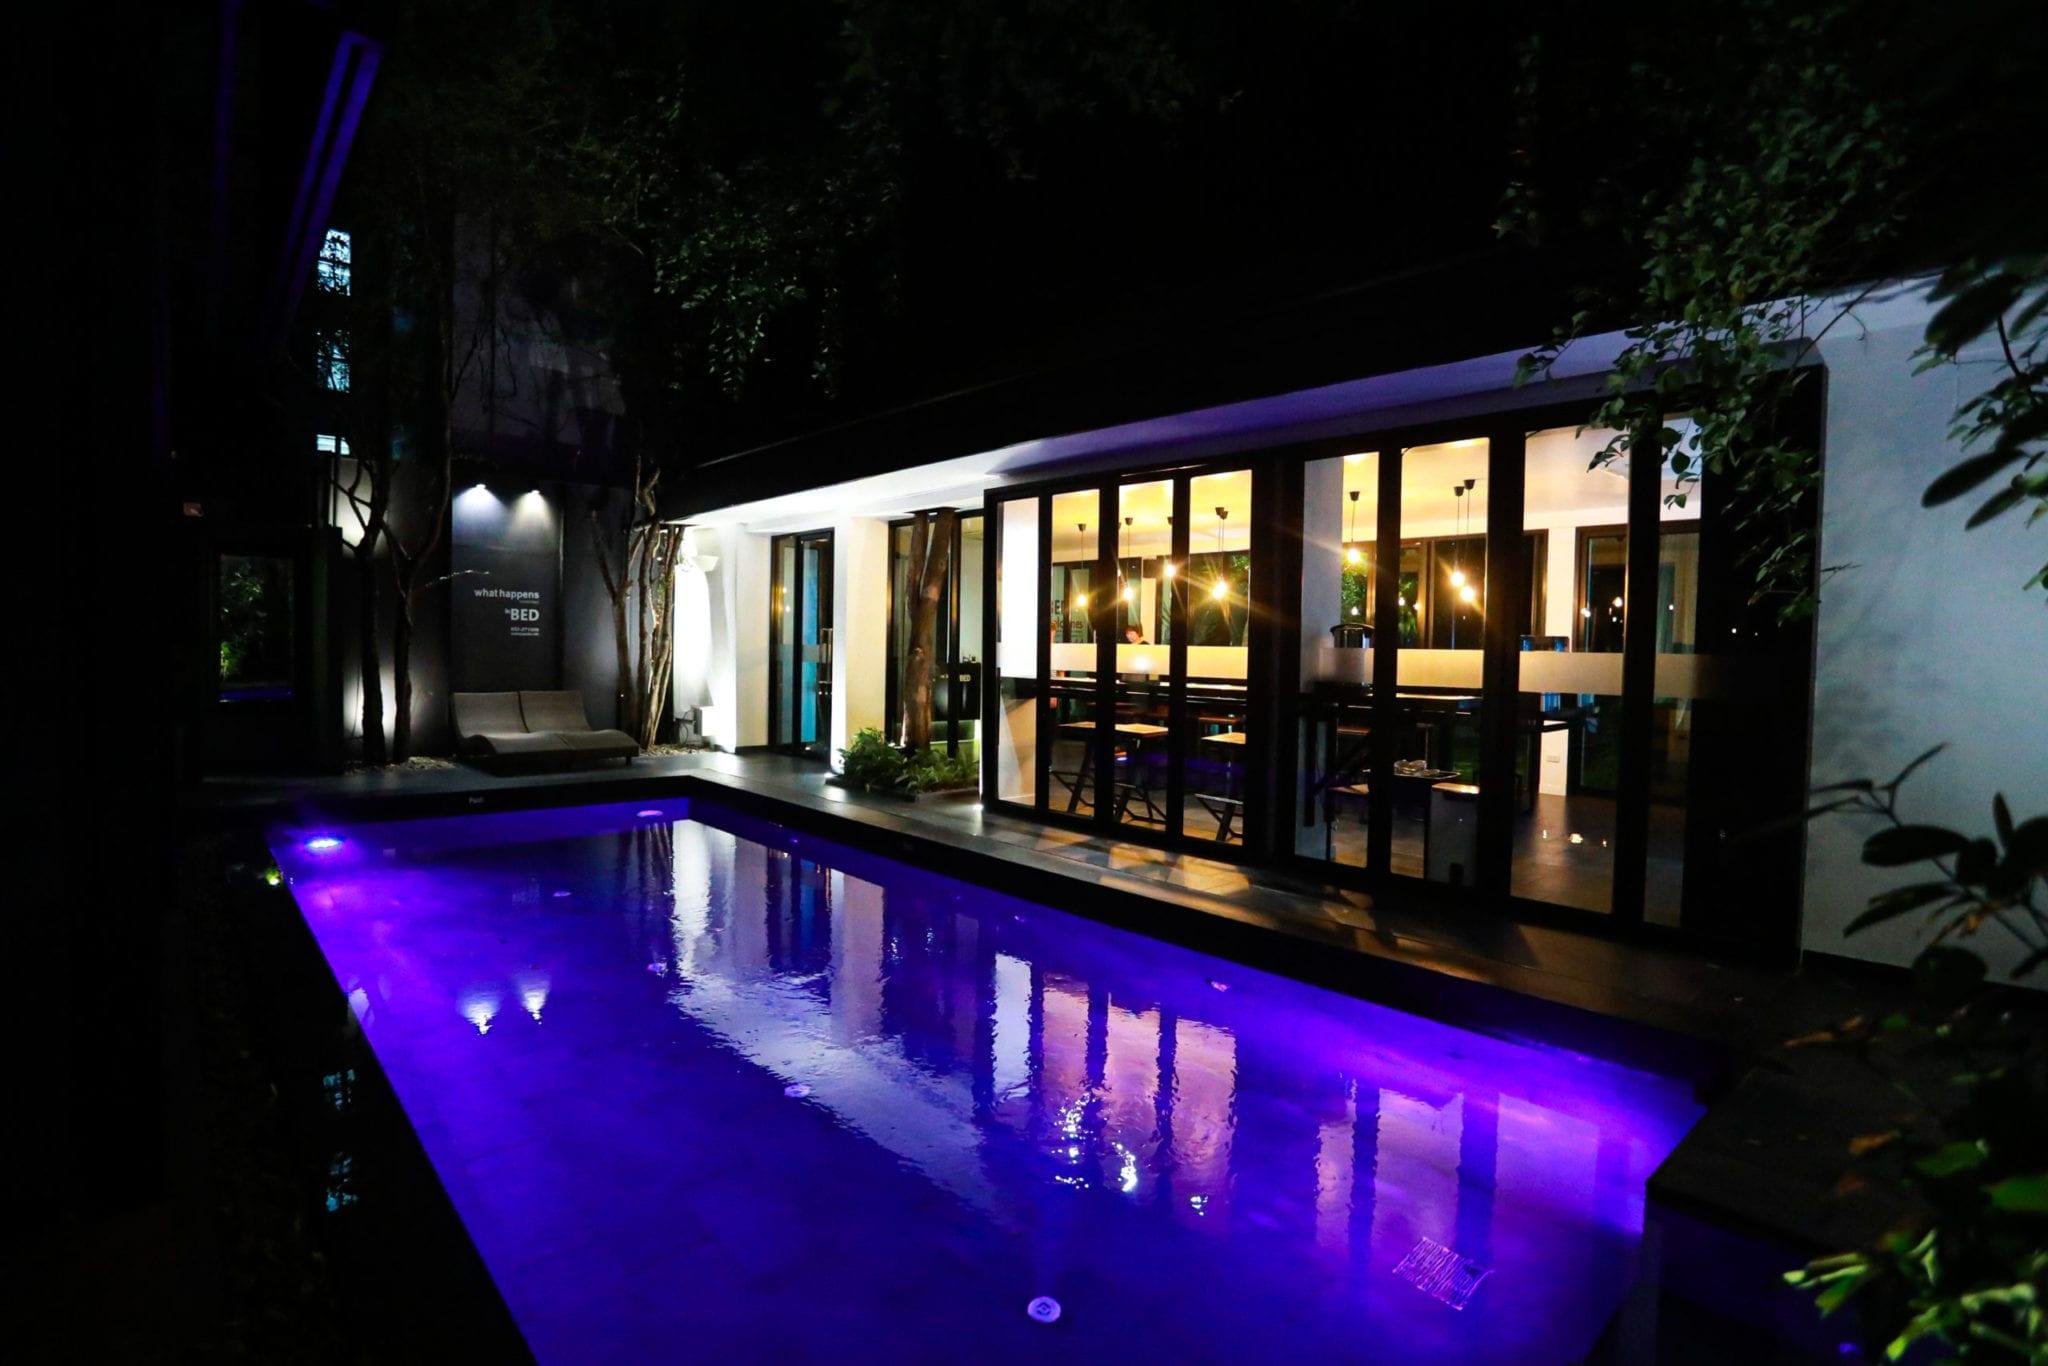 BED Phrasingh's pool at night